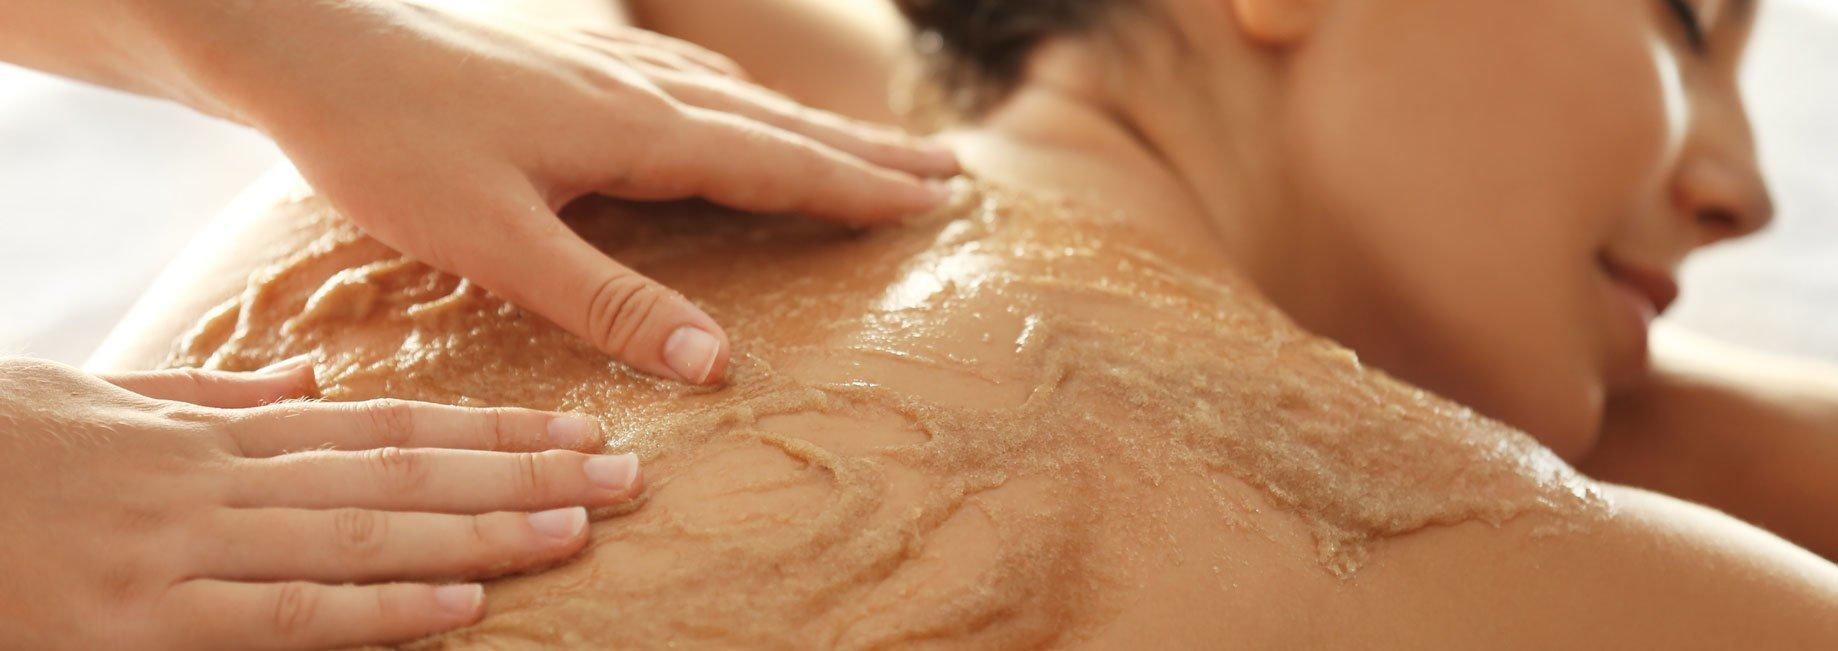 Massage Kosmetikstudio Zürich